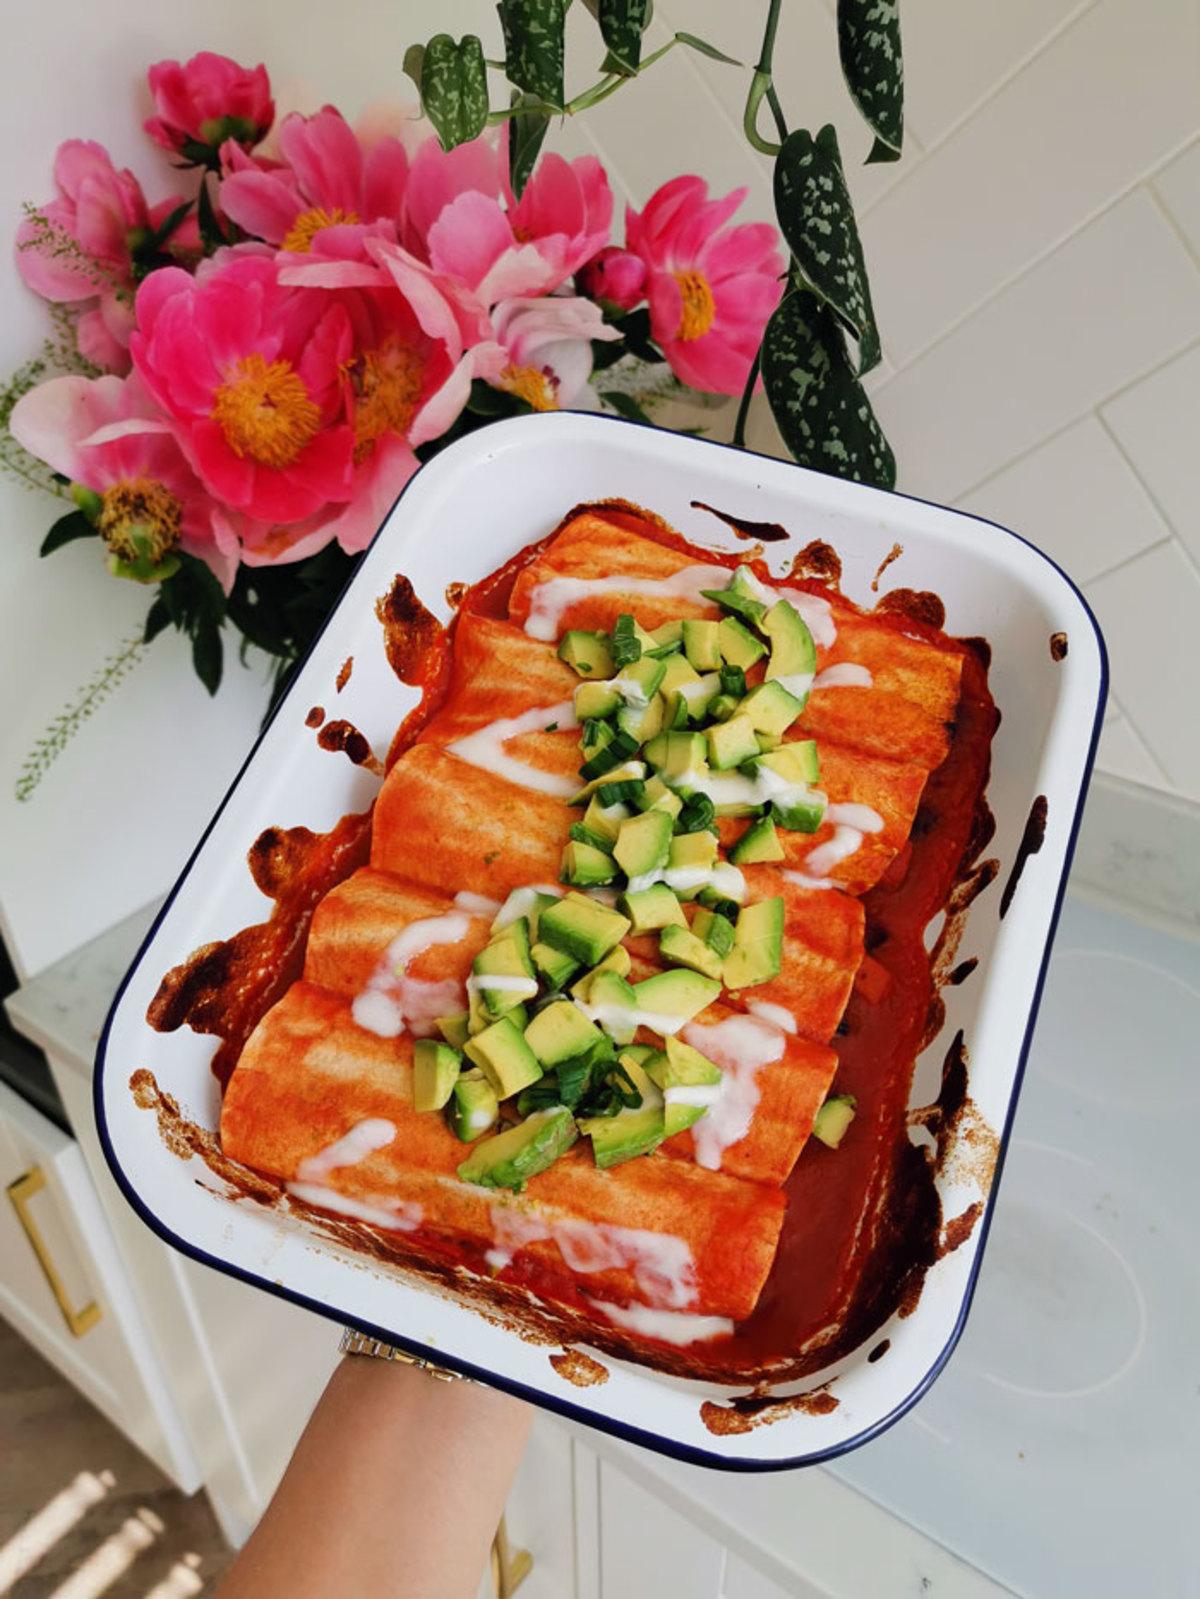 Madeleine's Family Friendly Squash & Black Bean Enchilada's in a ceramic bowl